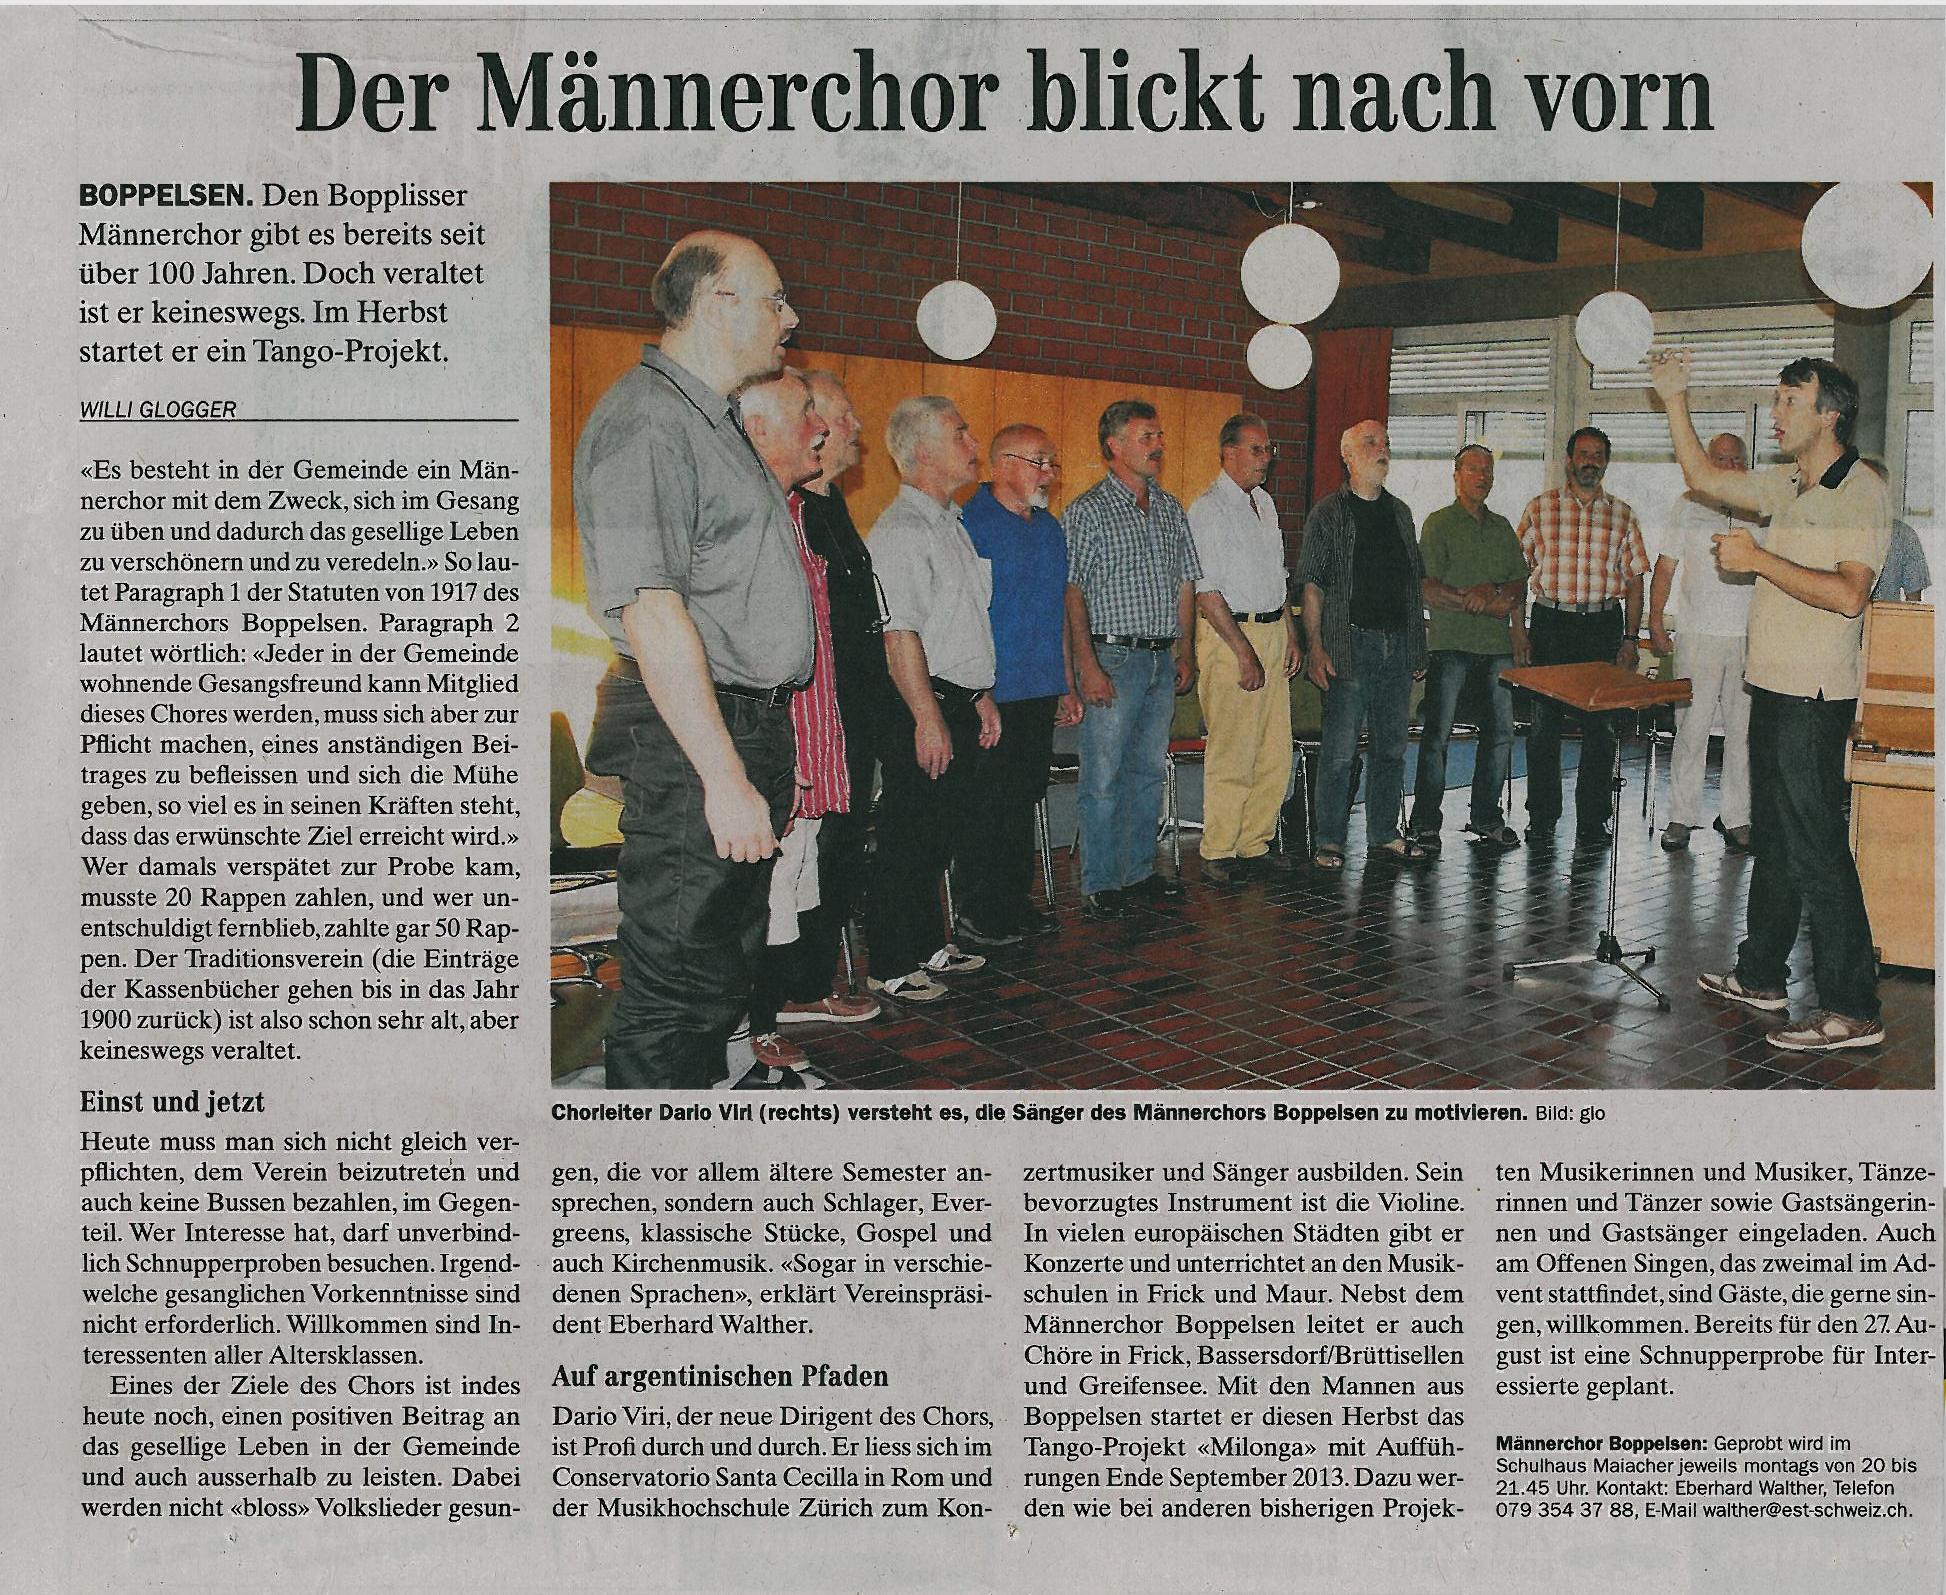 Furttaler 3.8.2012::Ankündigung Tango-Projekt